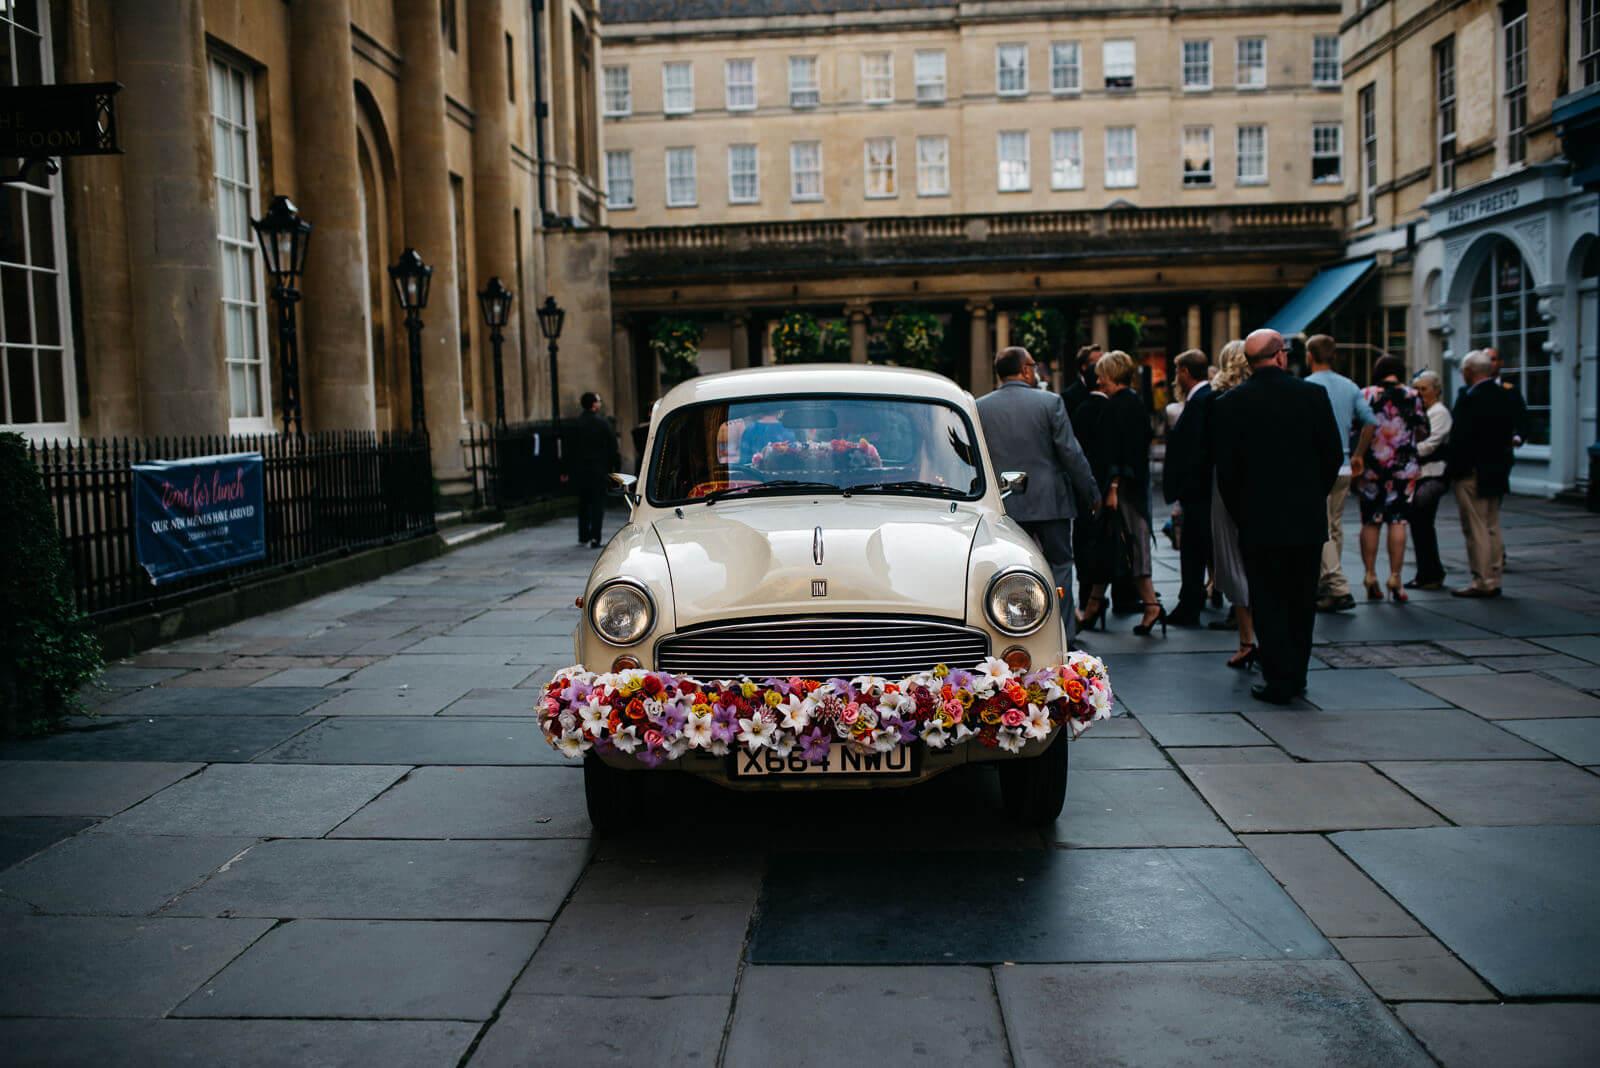 Empress of India wedding car waiting outside the Roman Baths